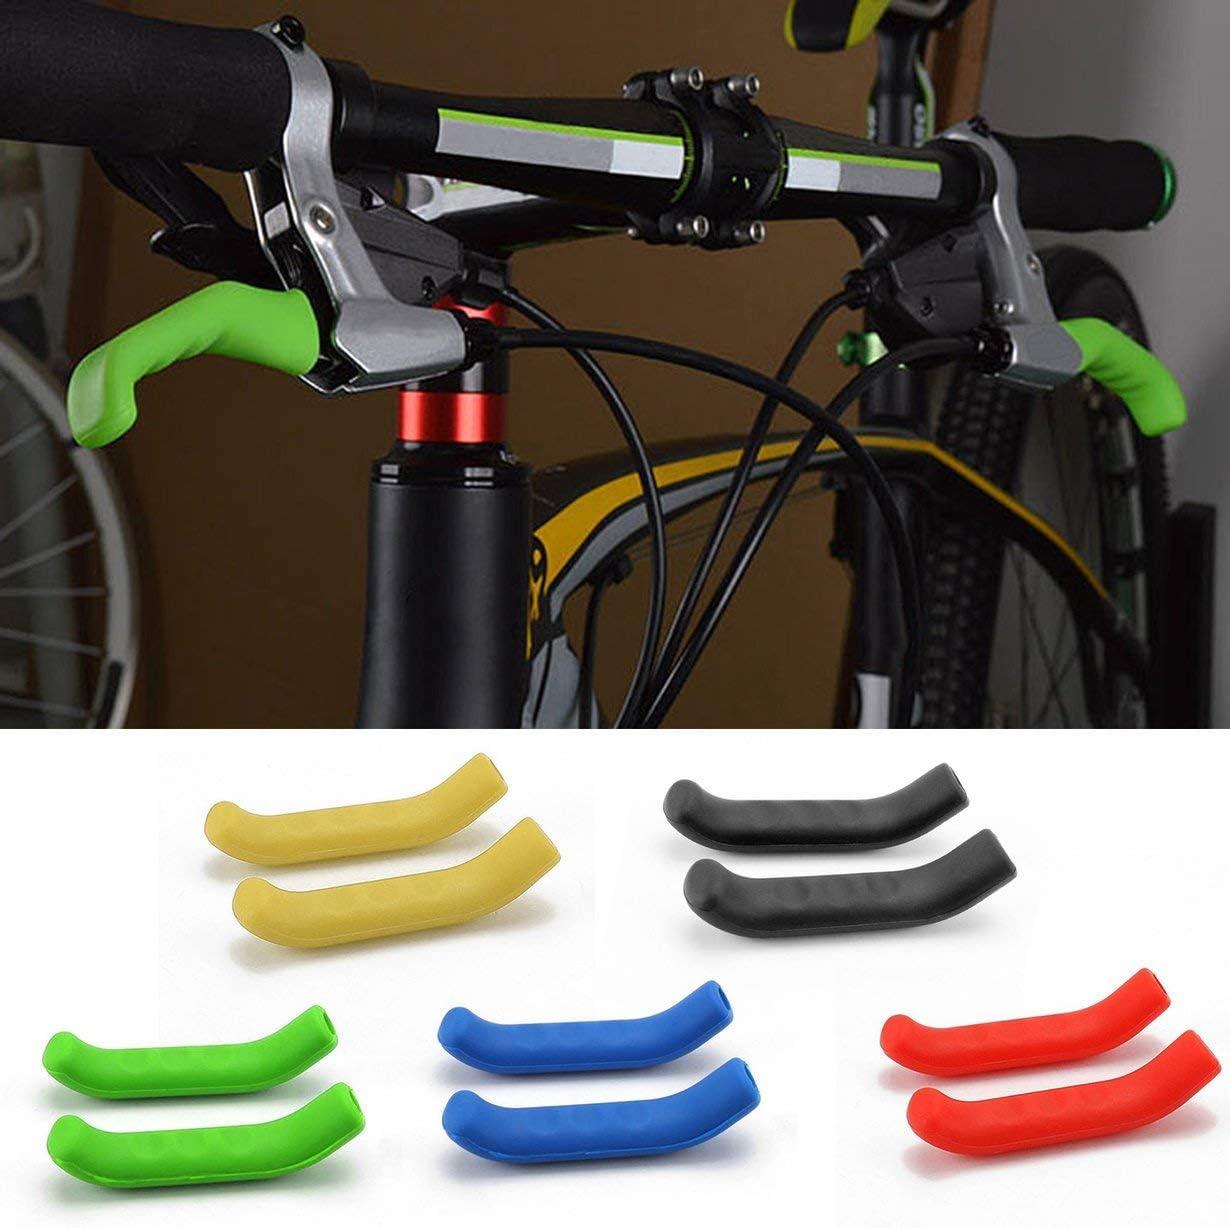 camellia/® Silikon Gel Universal Typ Bremse Lenker Grip Tool Hebel Schutz Abdeckung Schutzh/ülle Shell f/ür Mountain Road Bike gr/ün